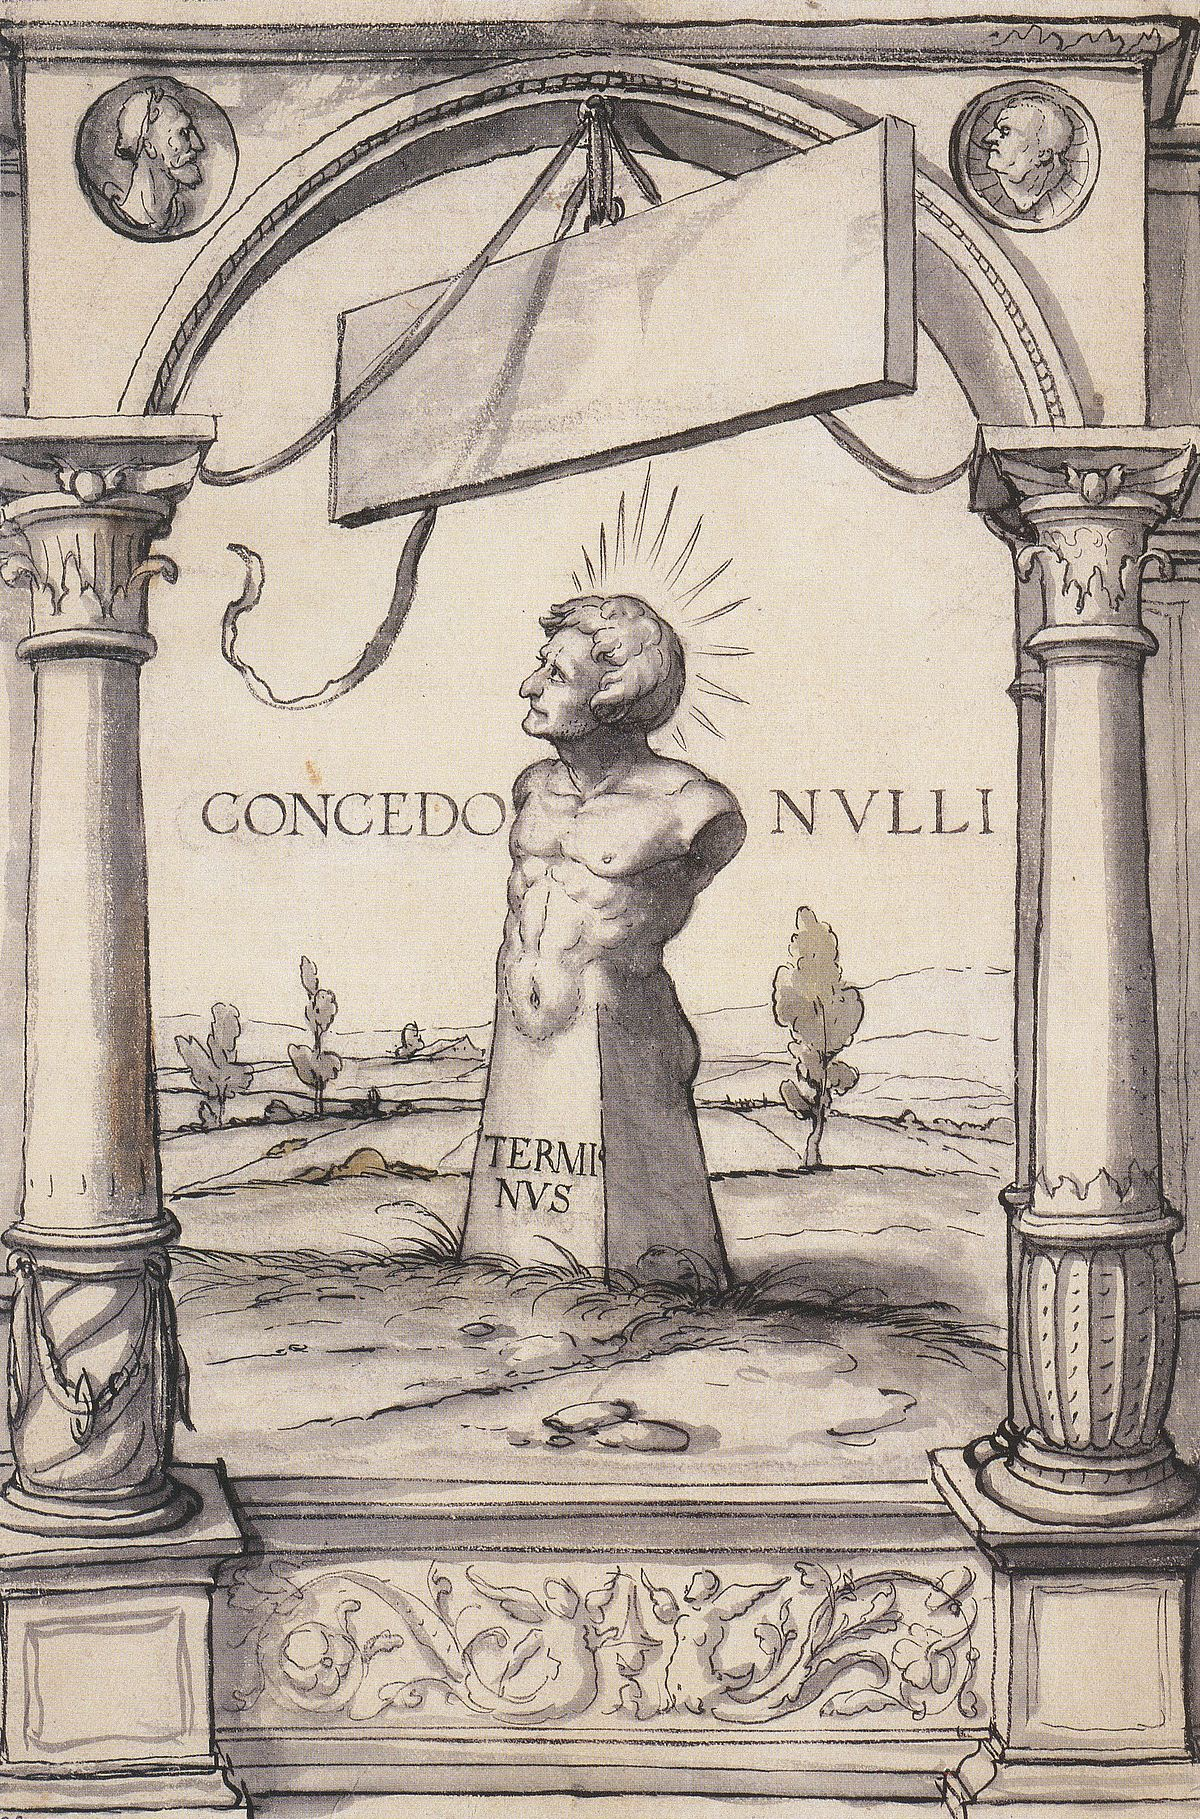 terminalis statue wikipedia